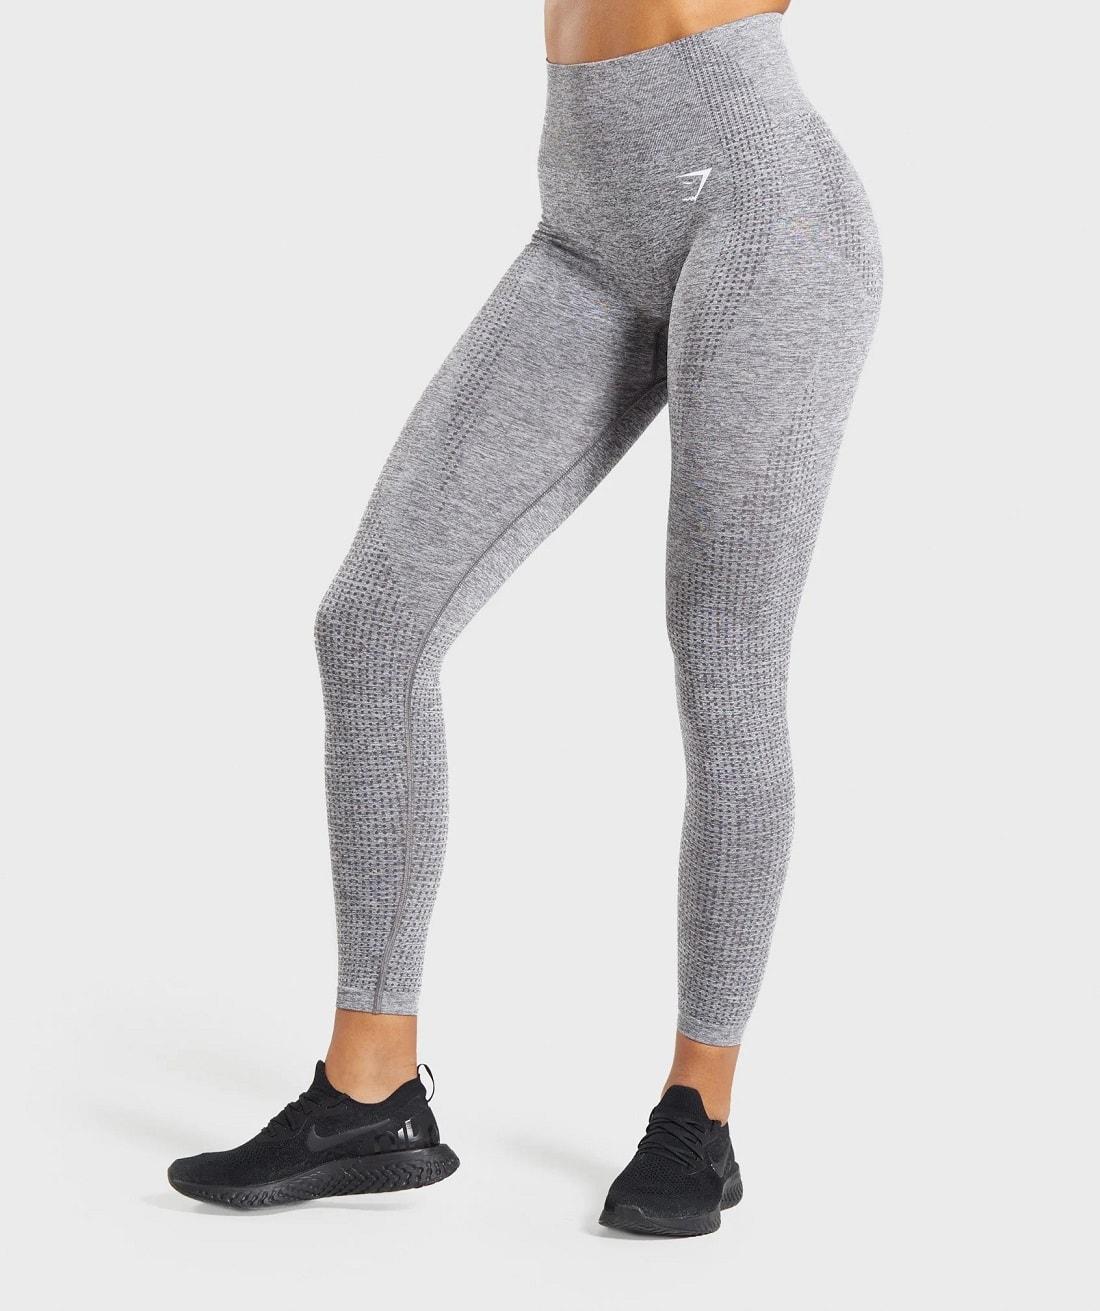 Best Gymshark Squat Proof and Compression Leggings